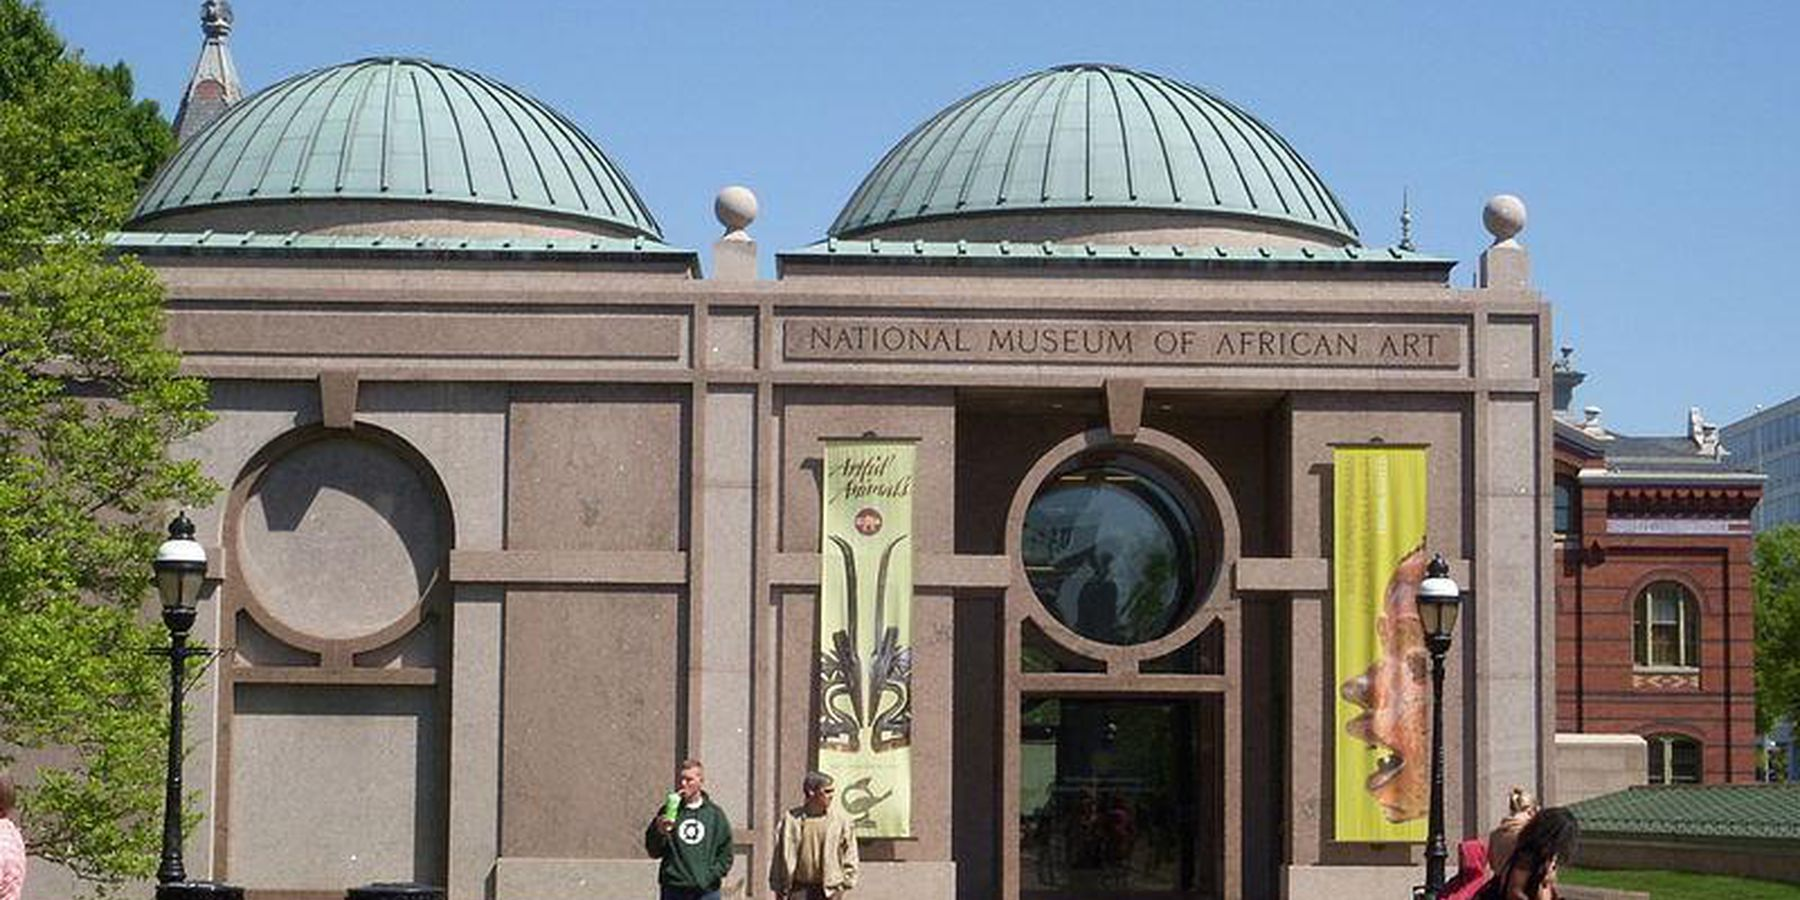 National Museum of the African Art - Washington D.C. - Doets Reizen